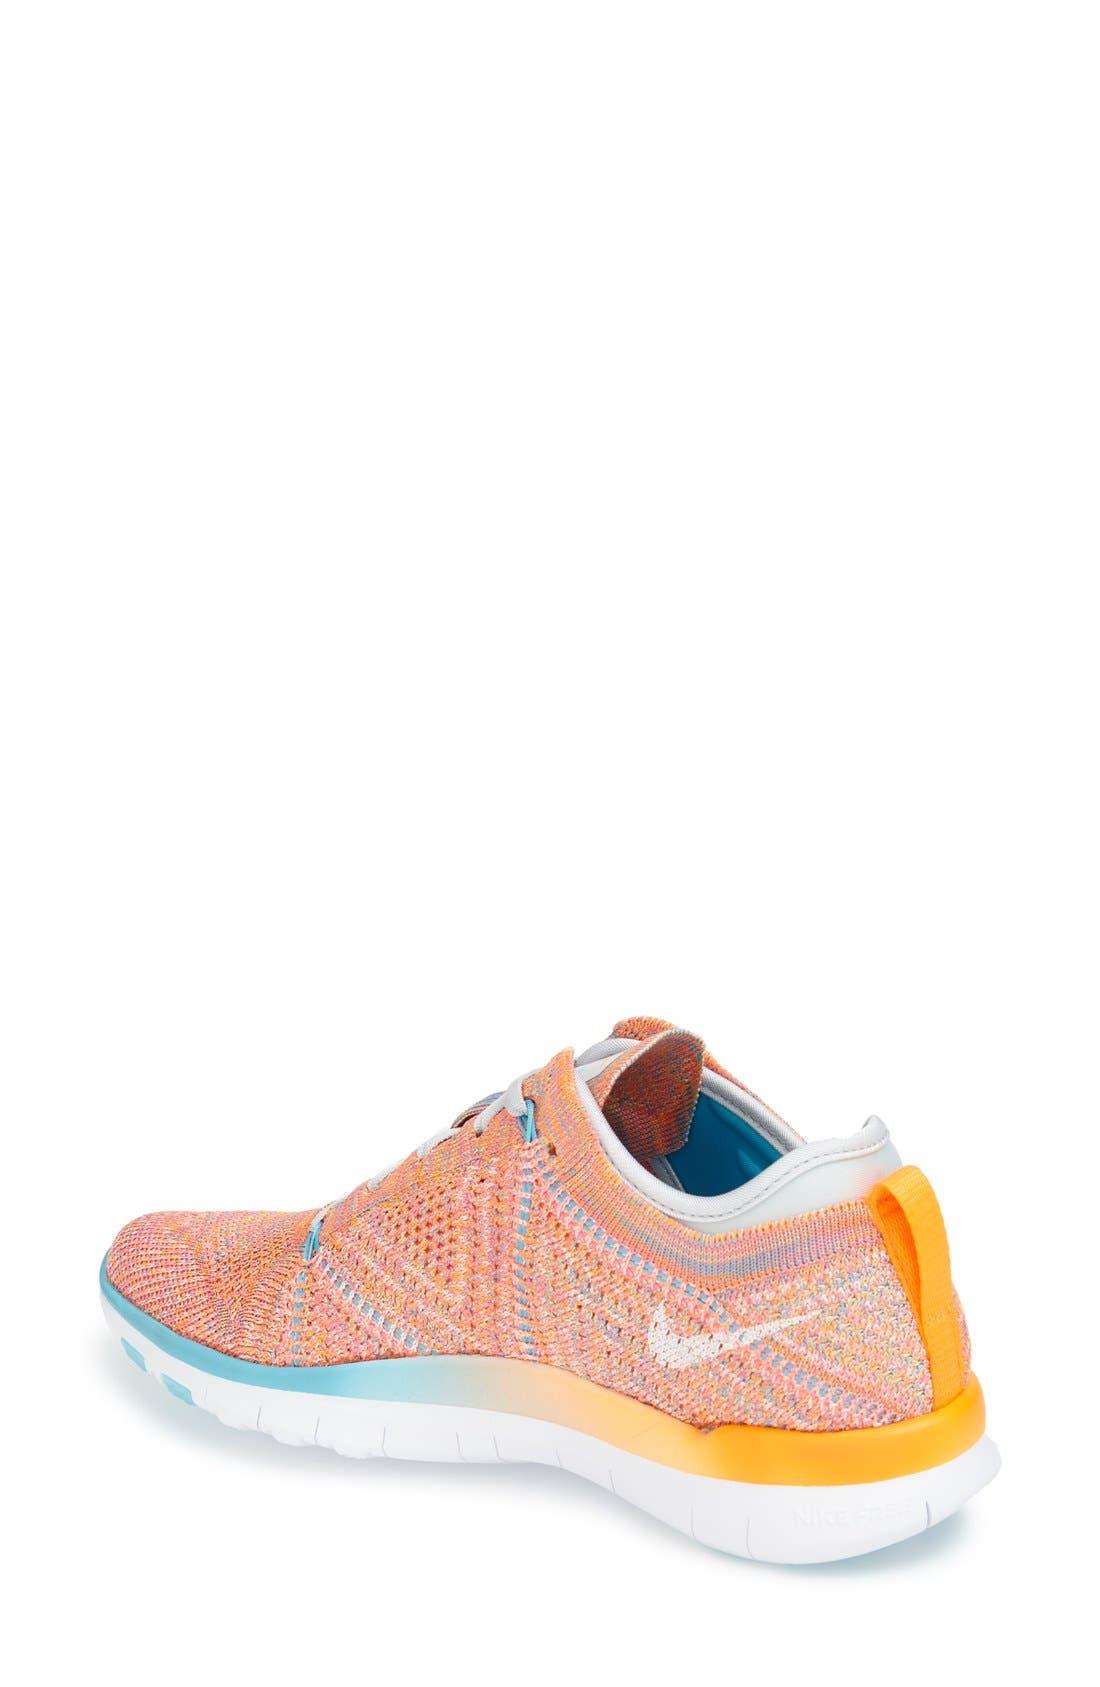 ,                             'Free Flyknit 5.0 TR' Training Shoe,                             Alternate thumbnail 62, color,                             803